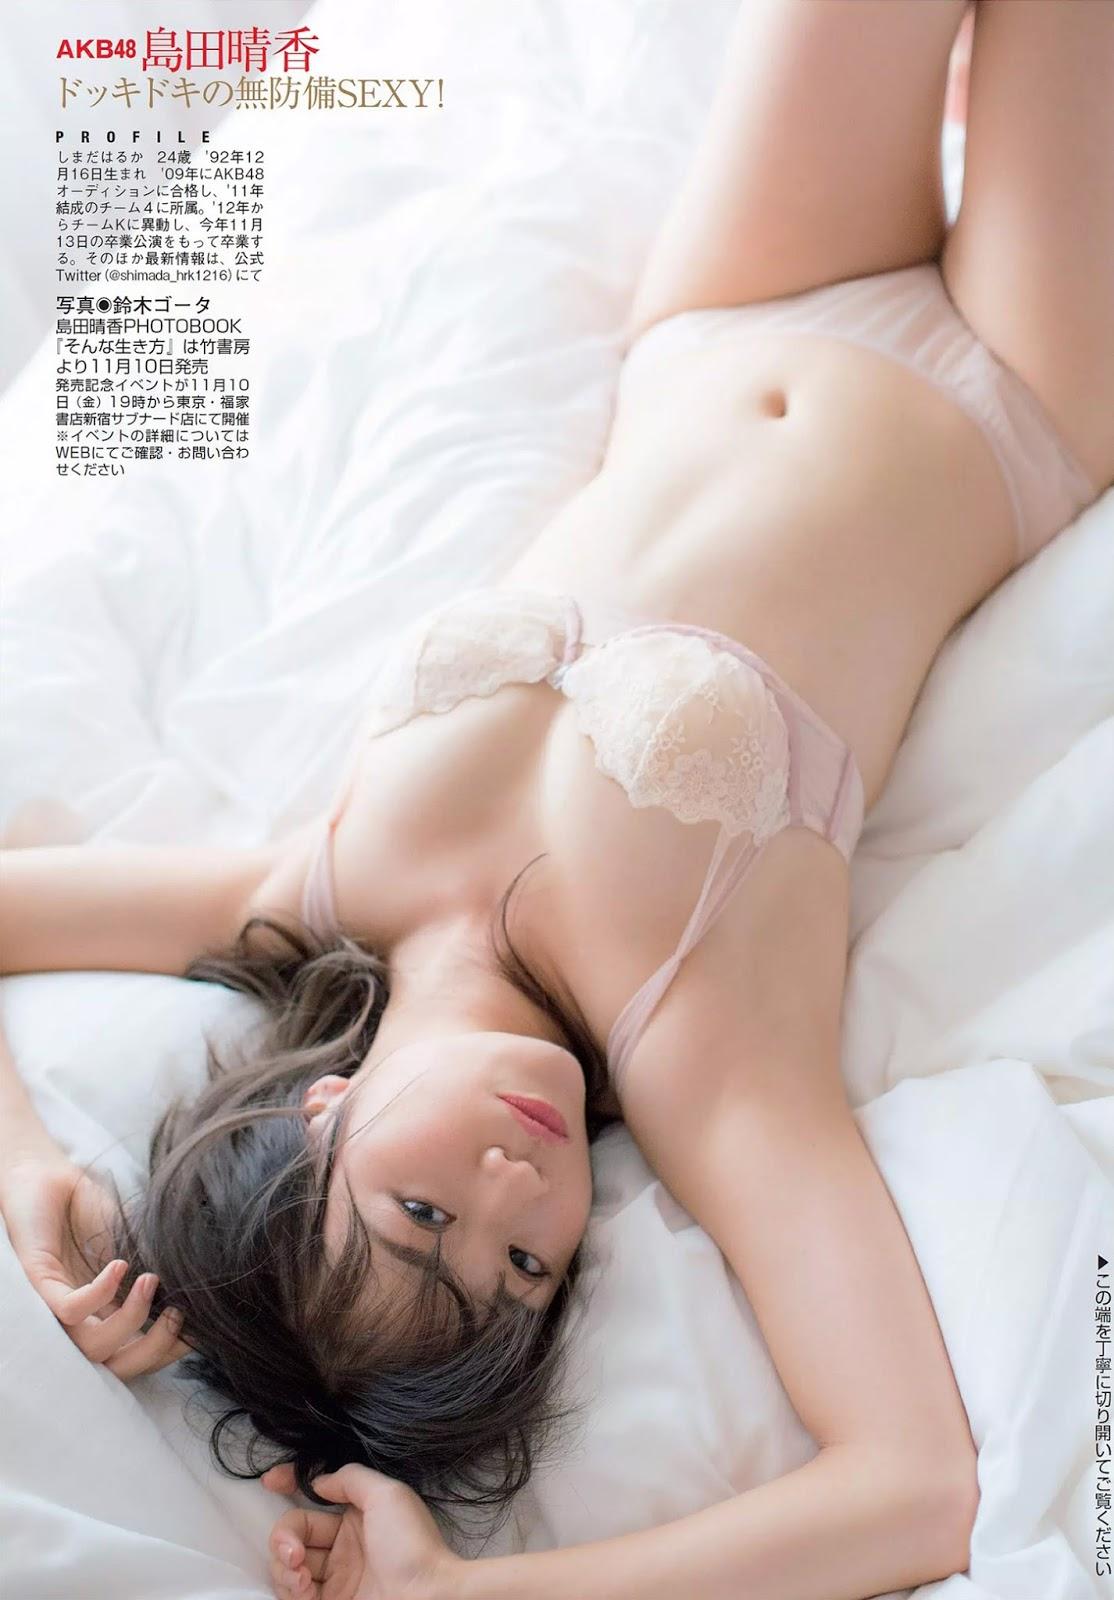 Shimada Haruka 島田晴香, FLASH 電子版 2017.11.07 No.1444 (フラッシュ 2017年11月07日号)